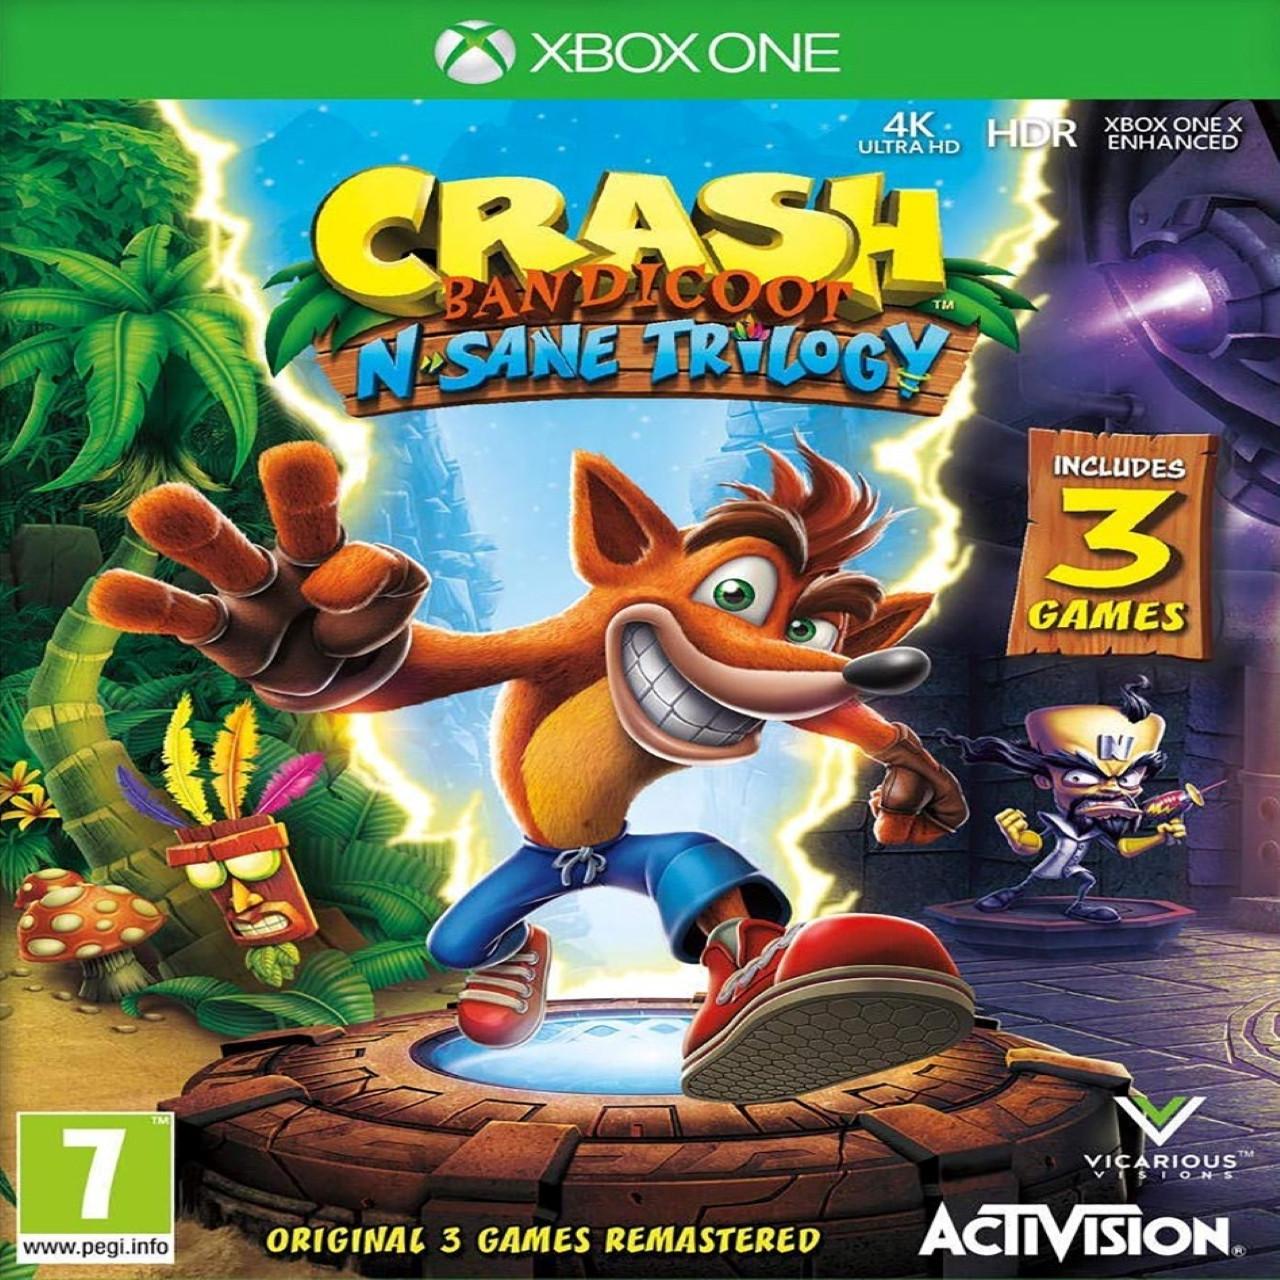 Crash Bandicoot N.Sane Trilogy ENG XBOX ONE